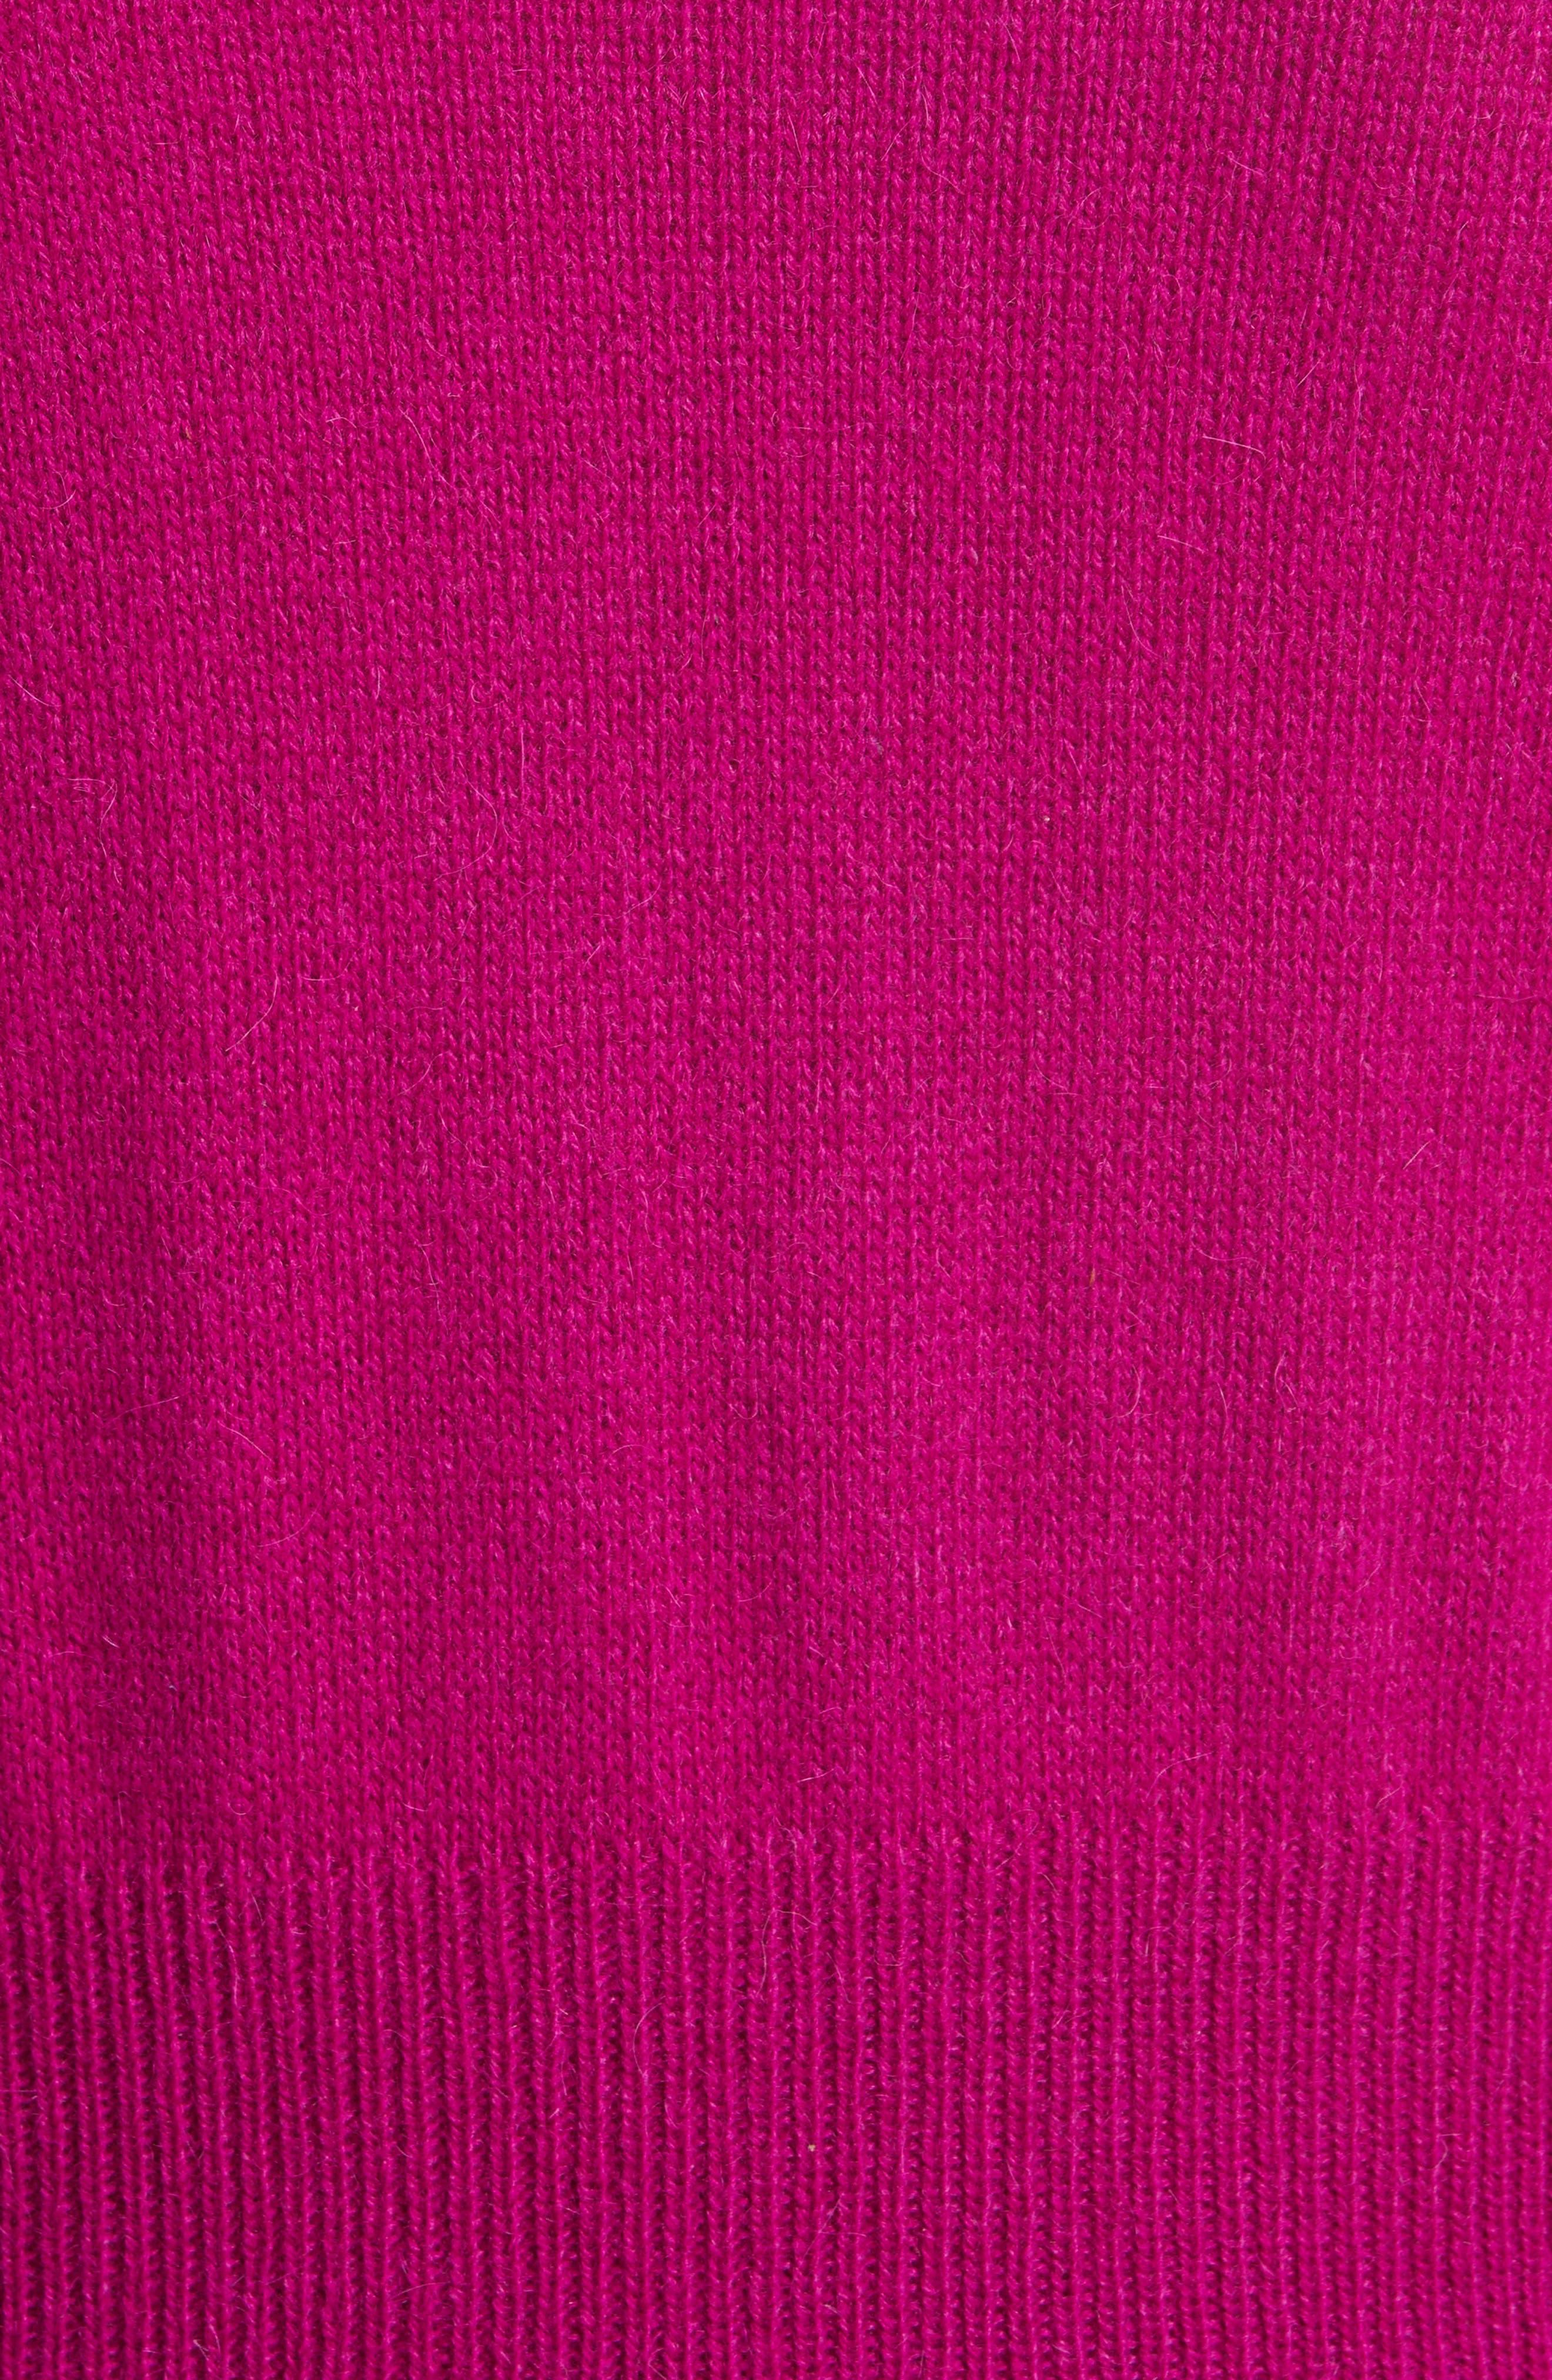 Flare Cuff Alpaca Blend Sweater,                             Alternate thumbnail 5, color,                             651